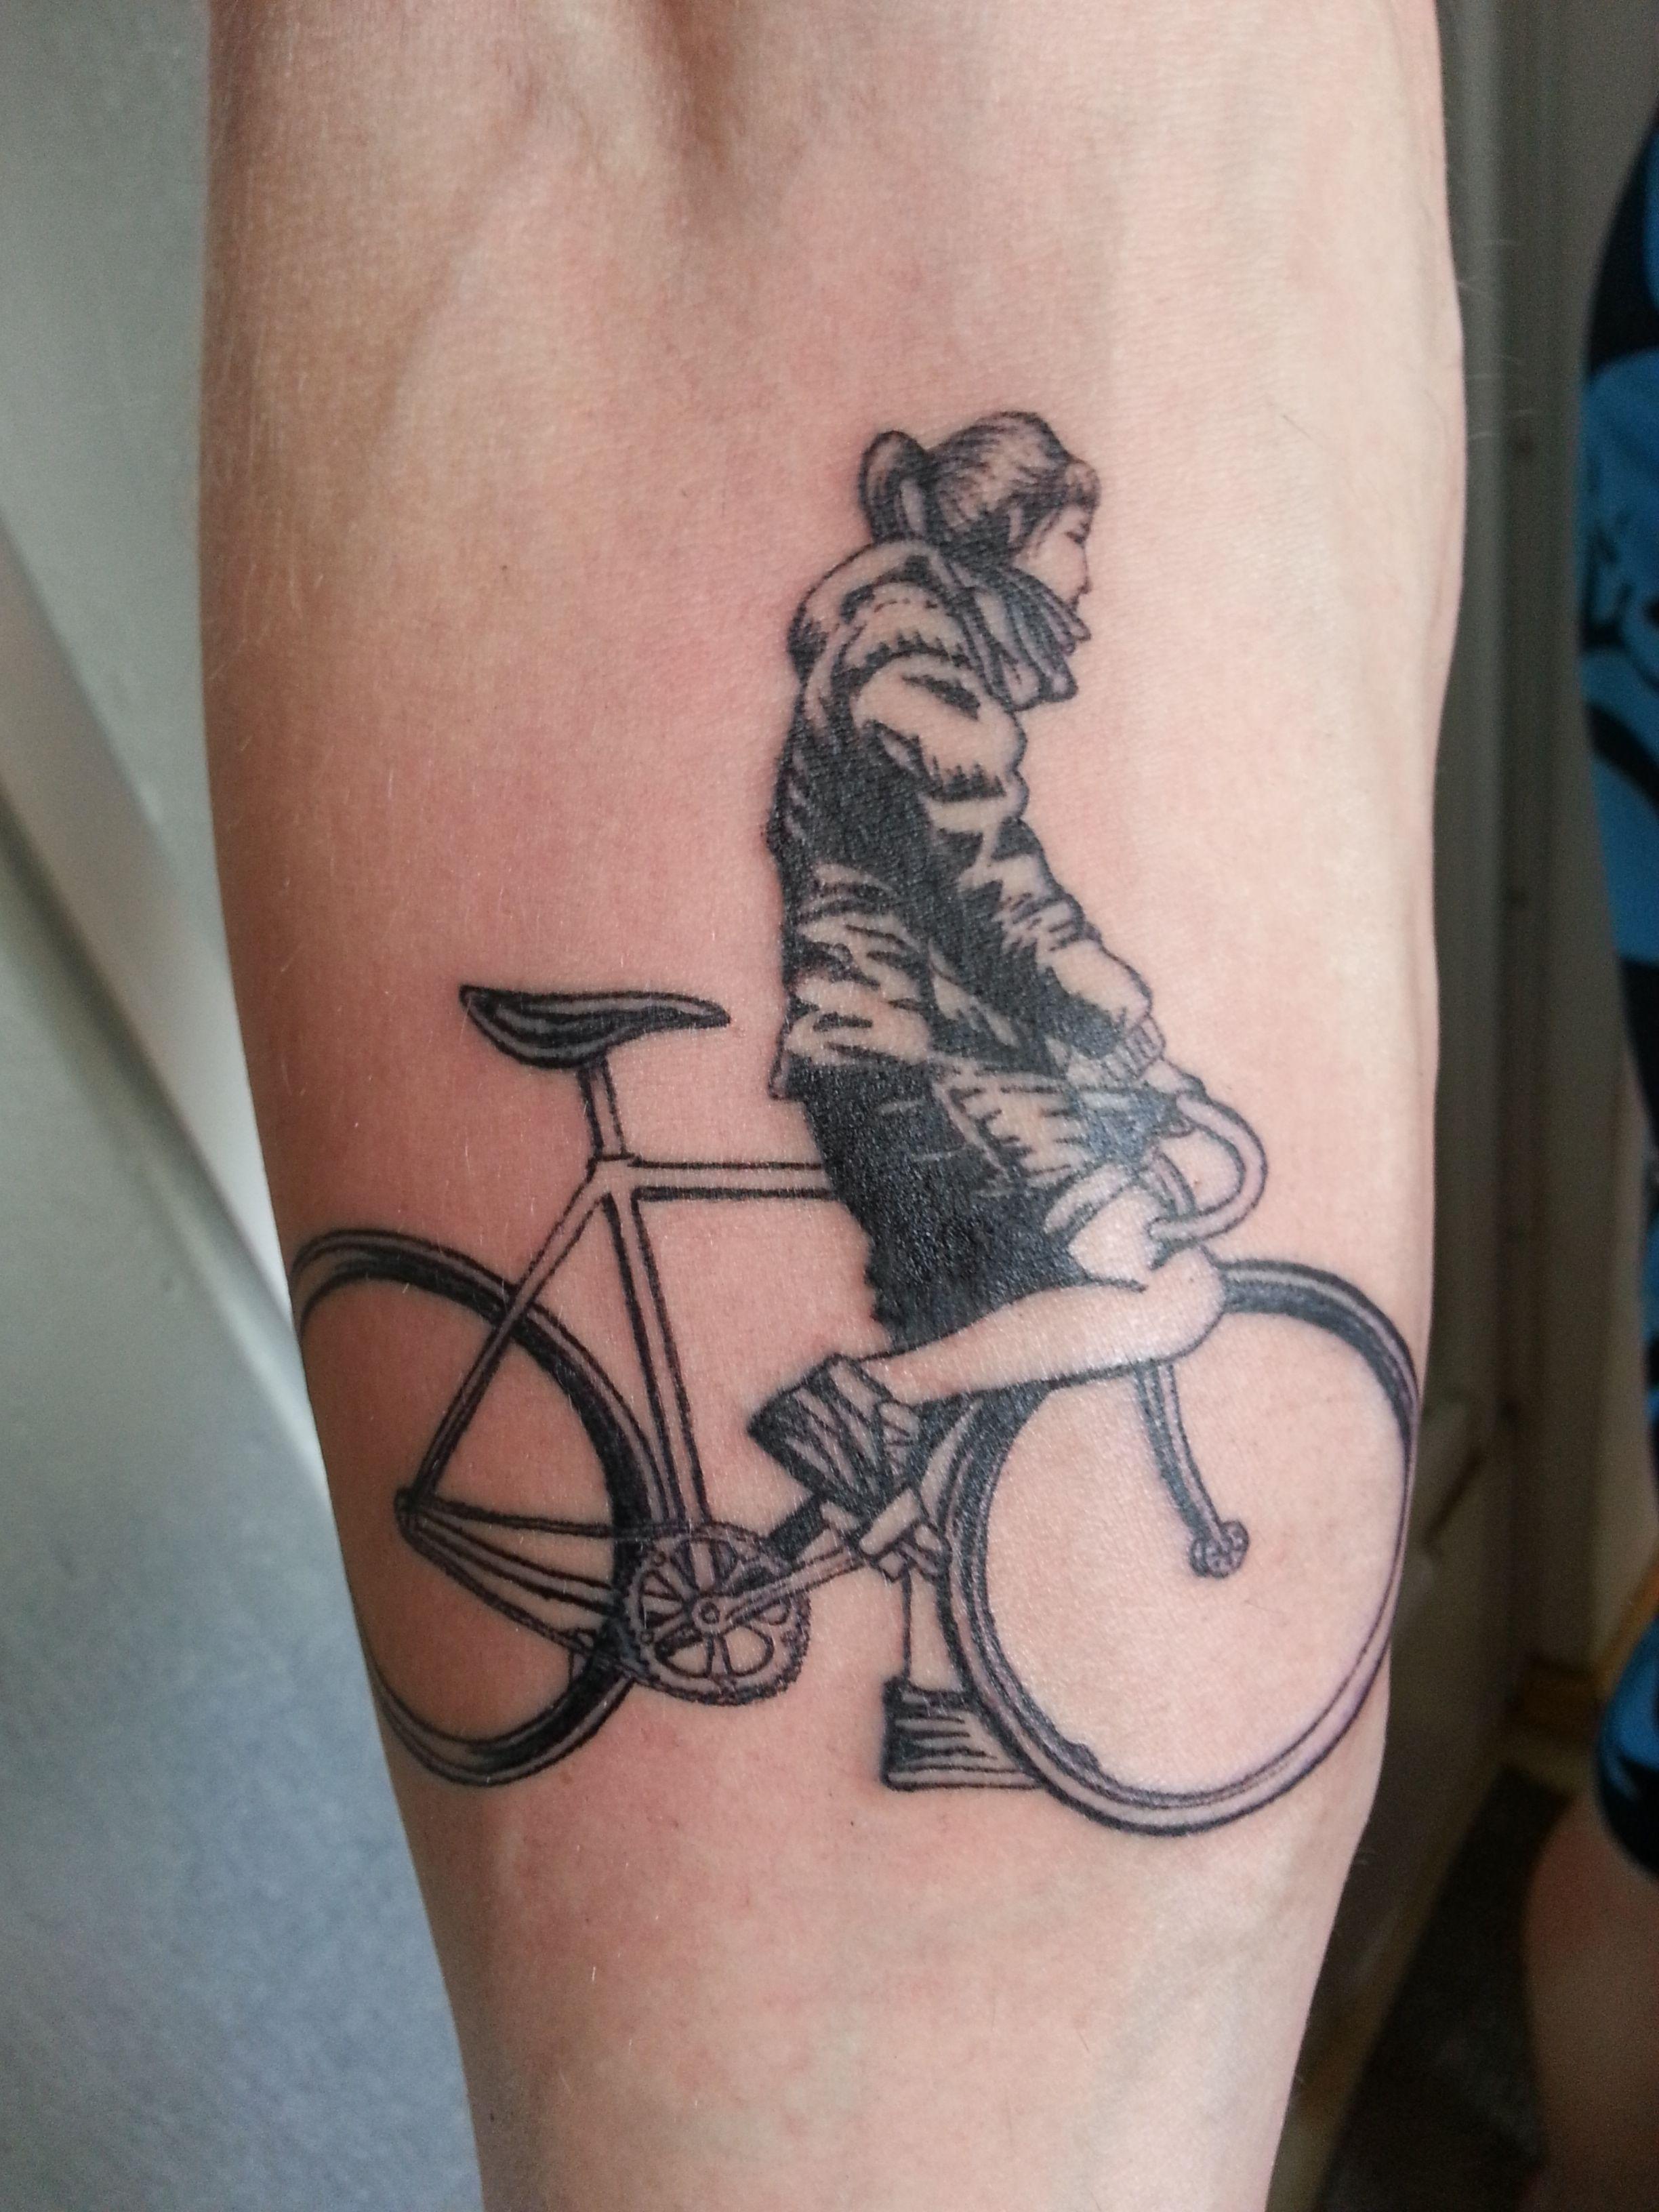 Cycling girl tattoos bicycletattoos biketattoos